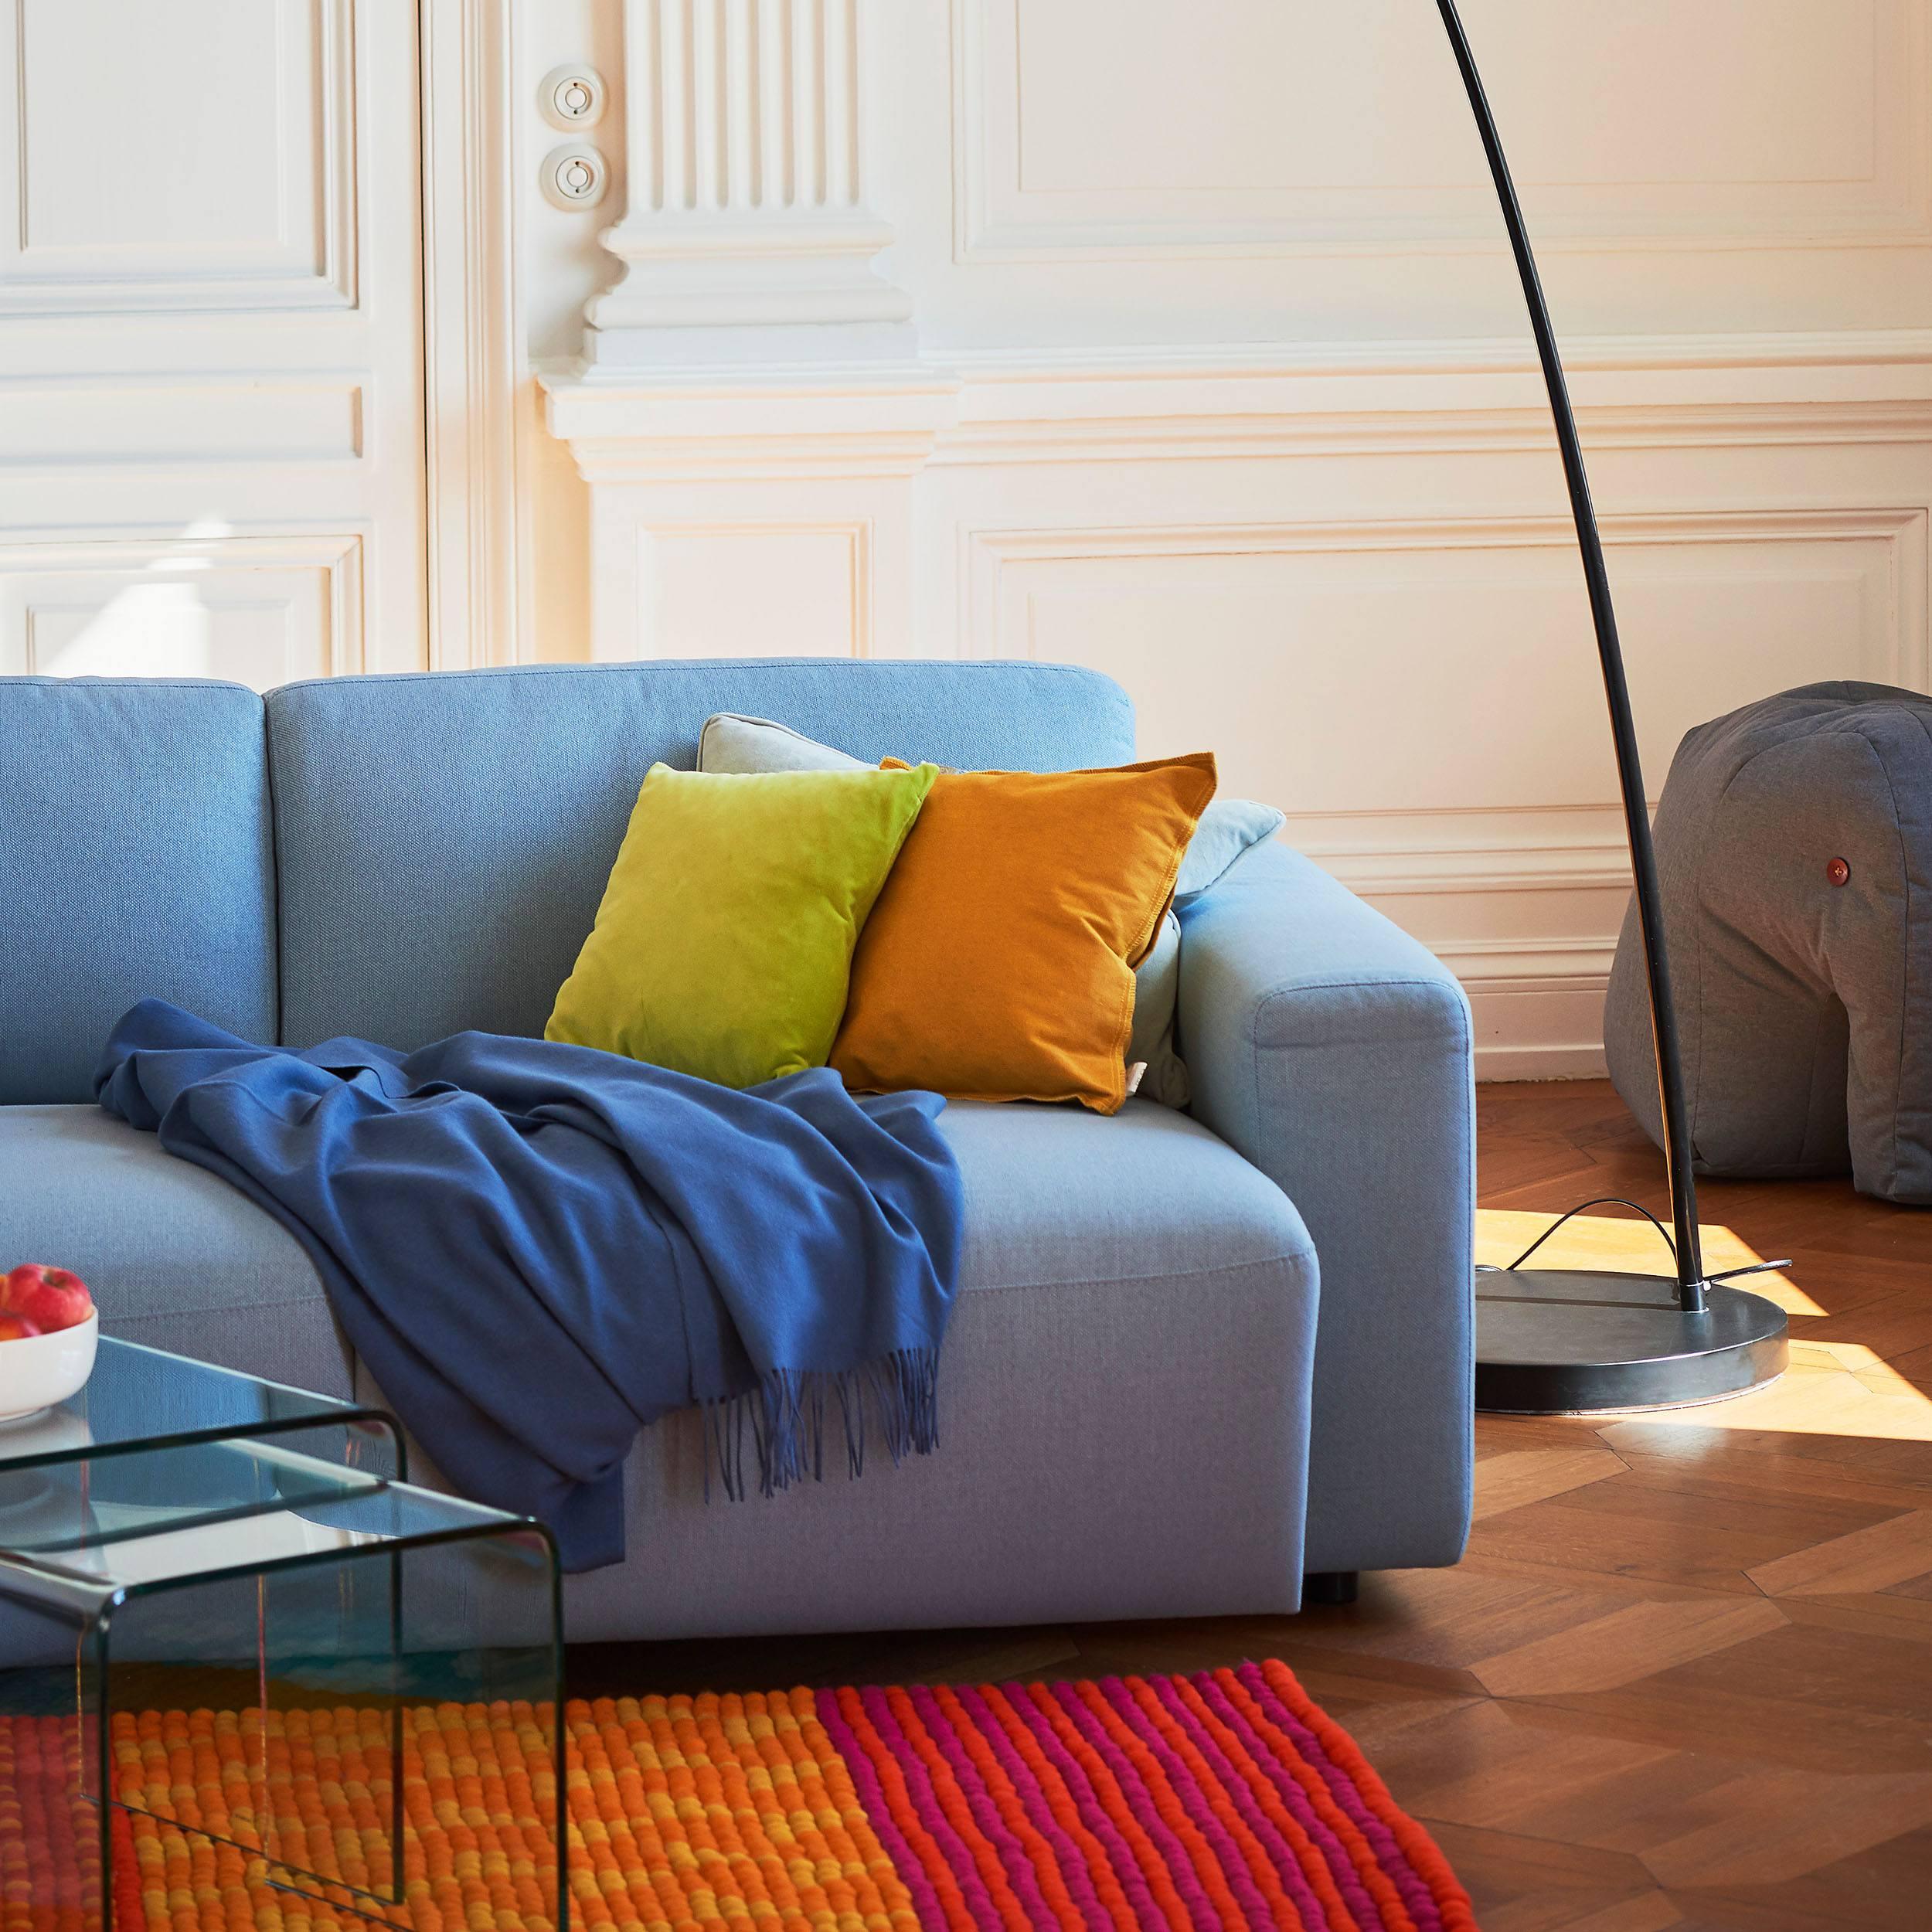 Clifden 3-Sitzer Sofa mit Sitzauszug motorisch